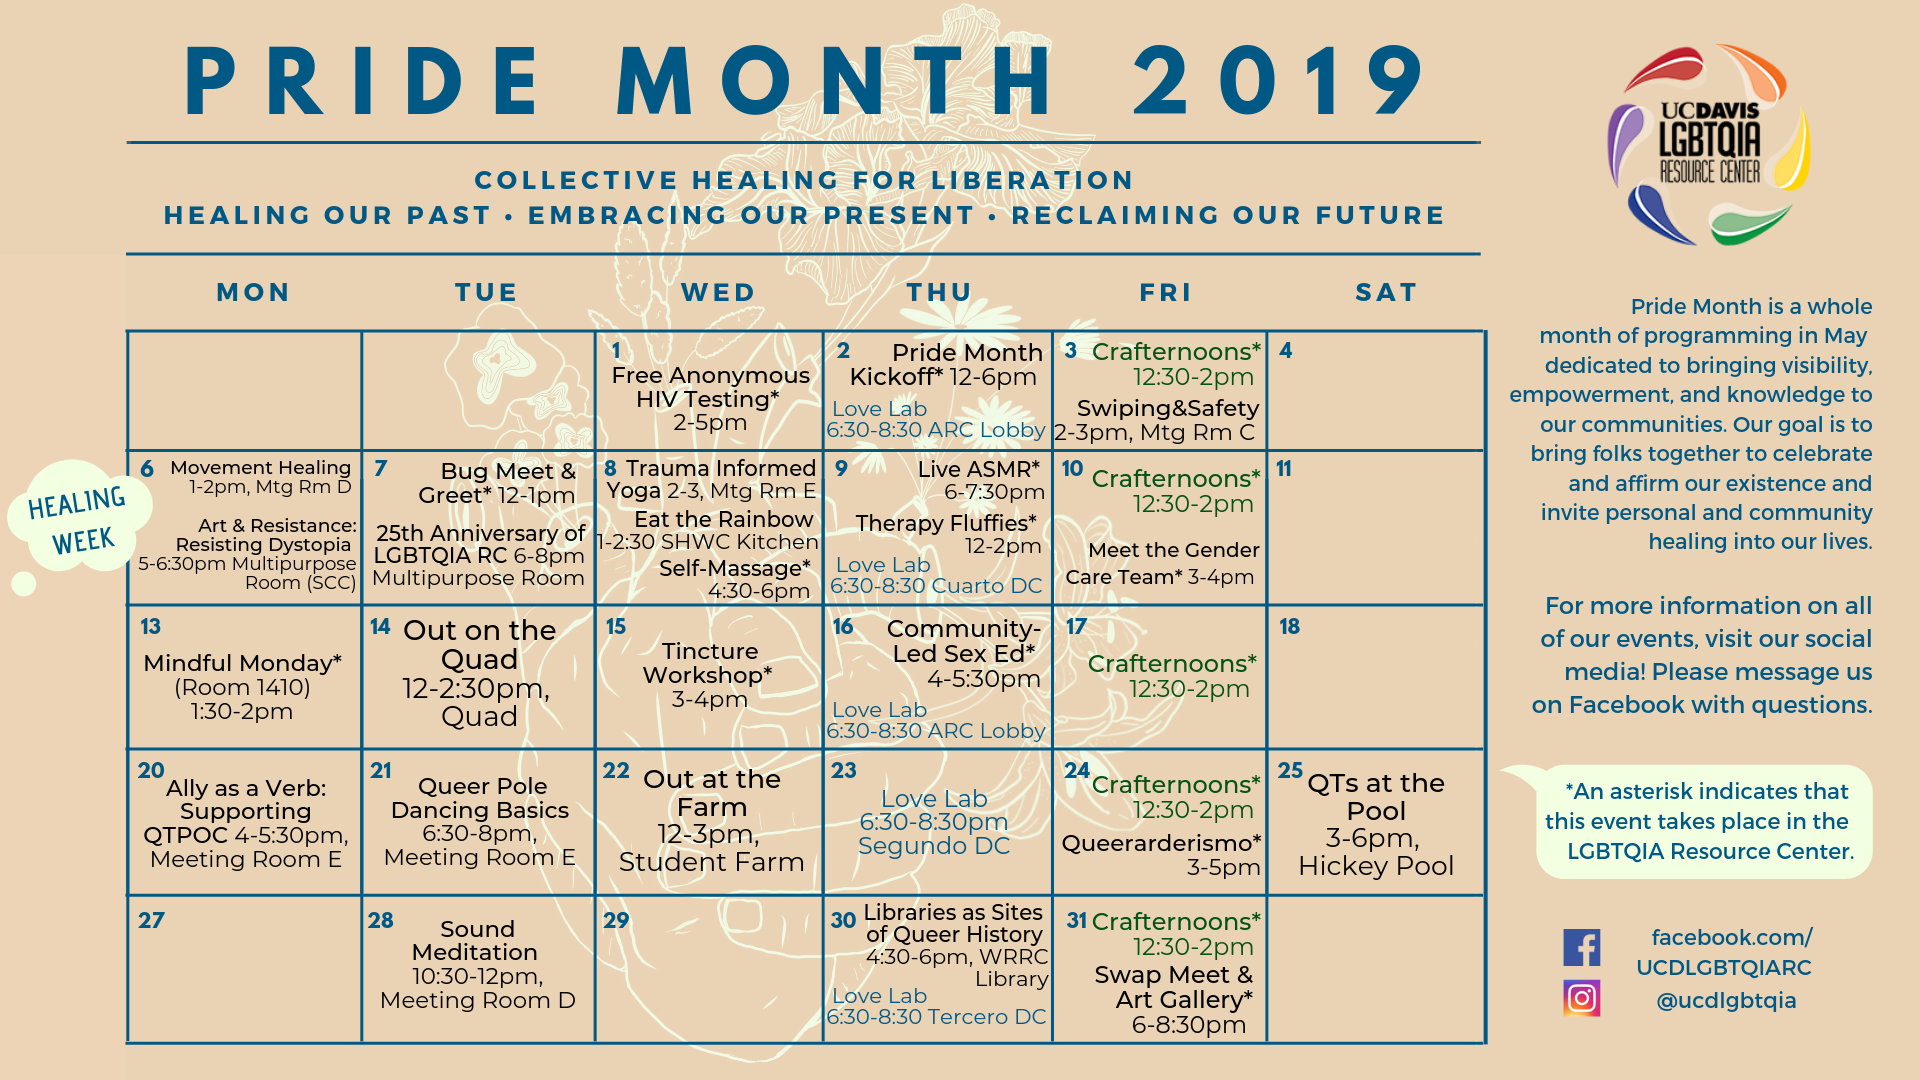 Gay Pride 2019 Calendar Pride Month | LGBTQIA Resource Center